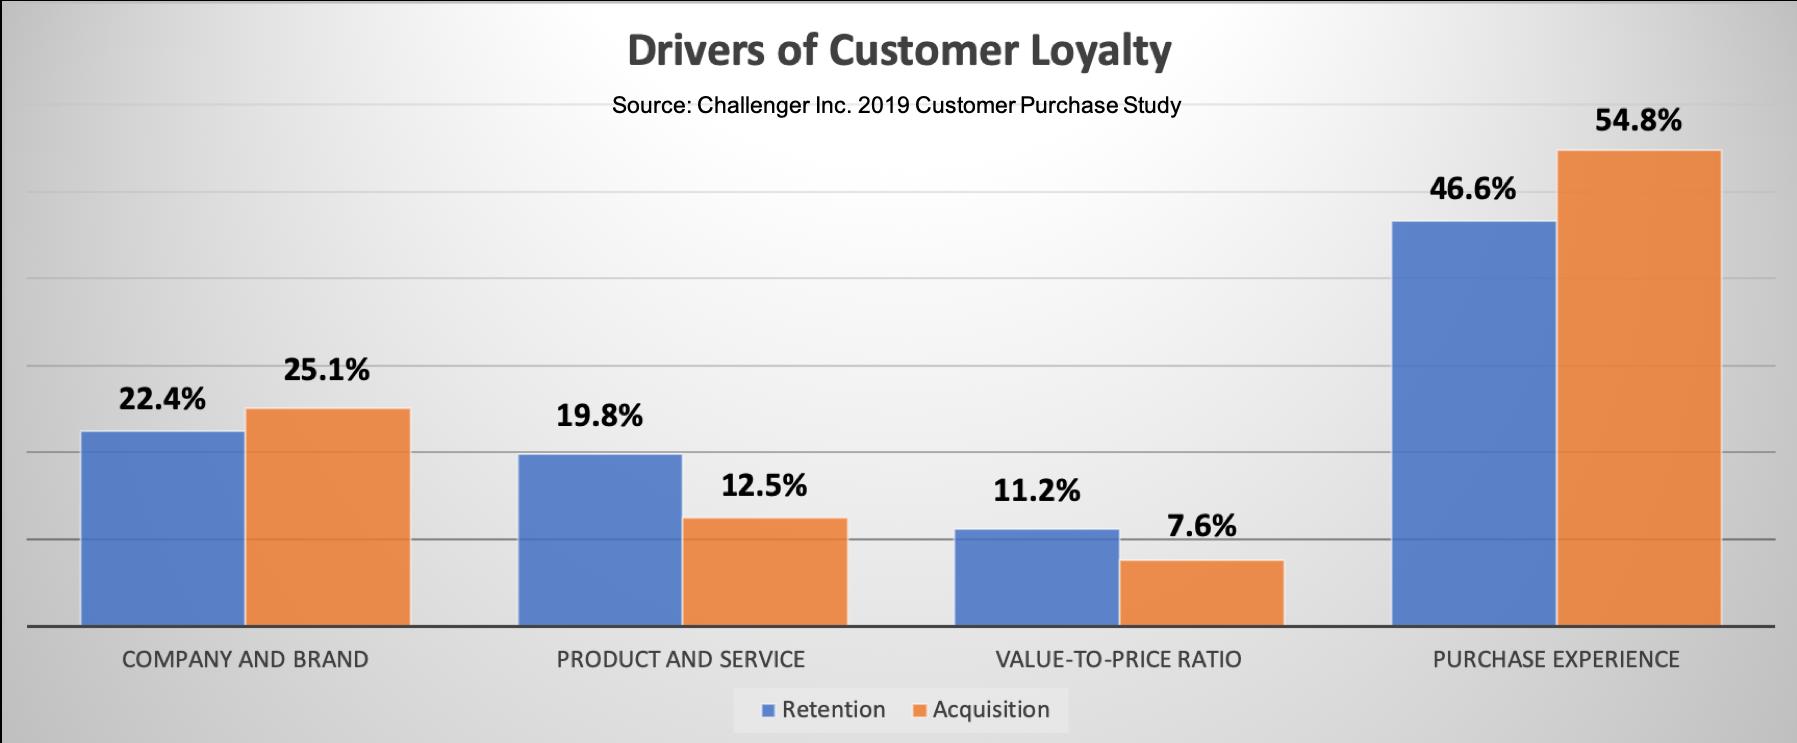 Drivers of Customer Loyalty 2